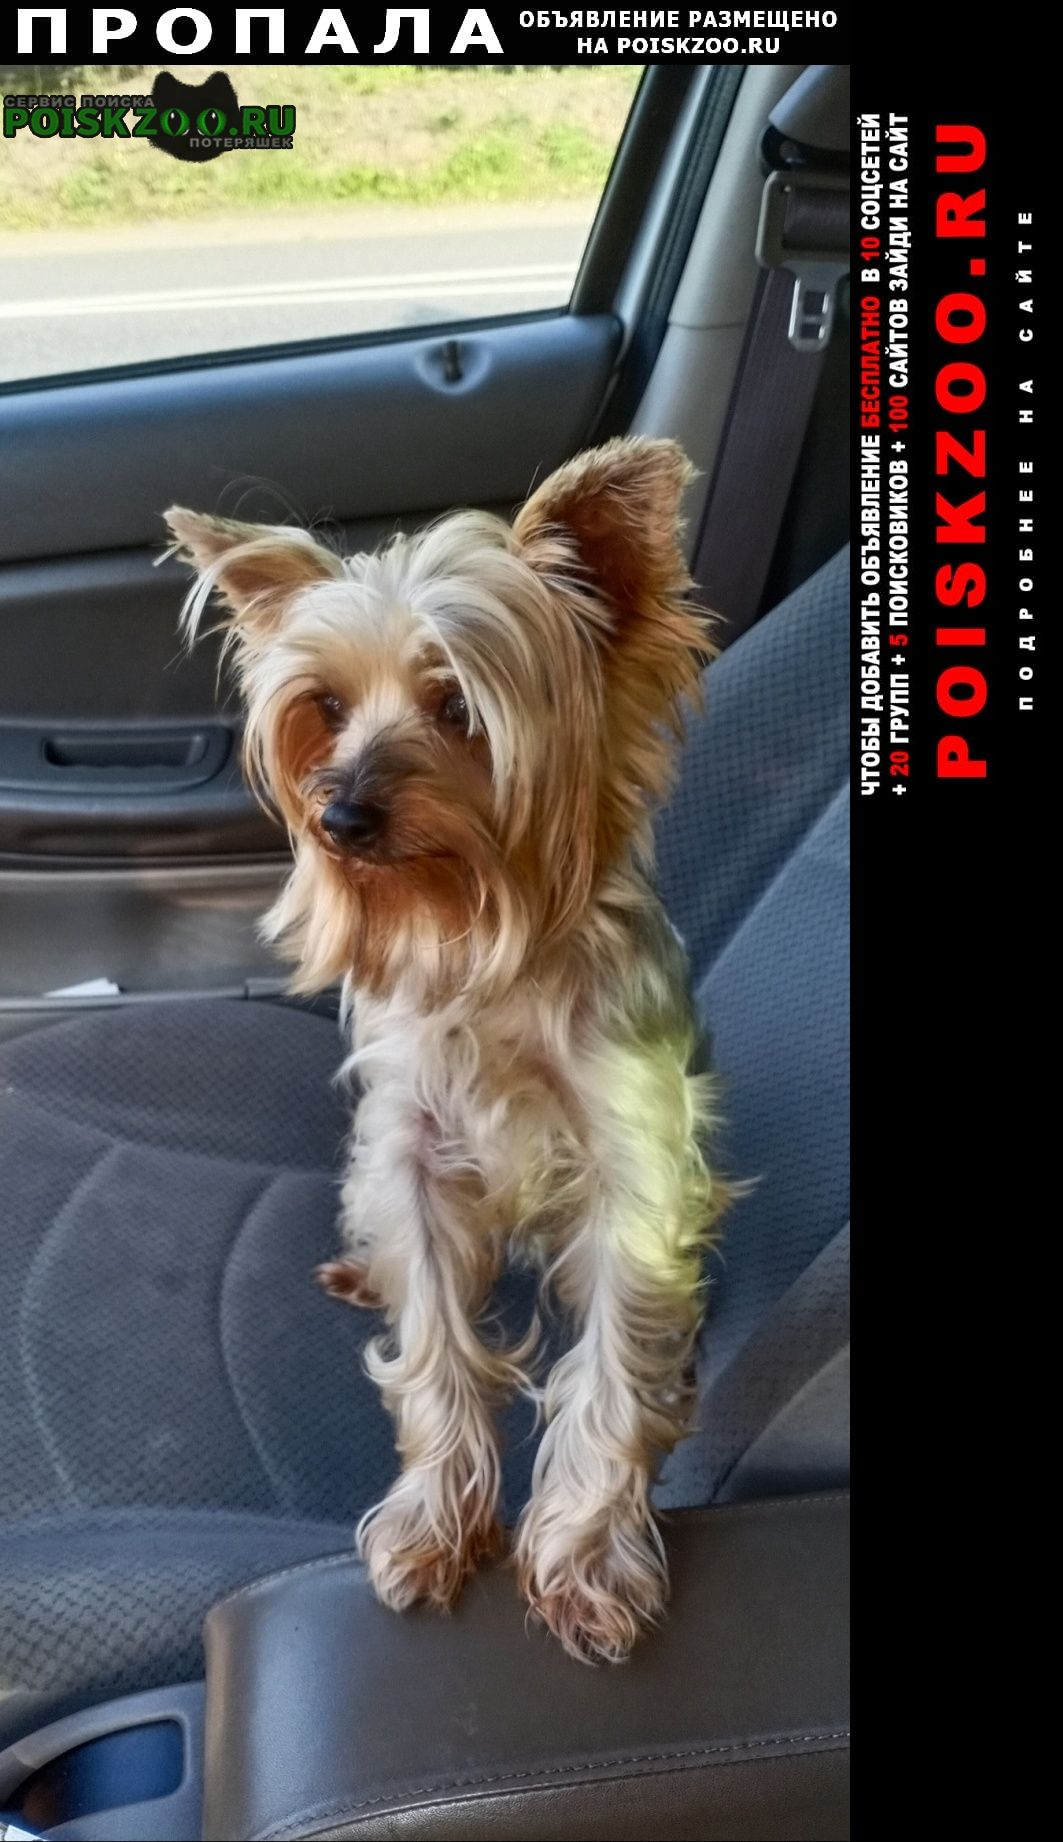 Пропала собака йоркширский терьер Солнечногорск